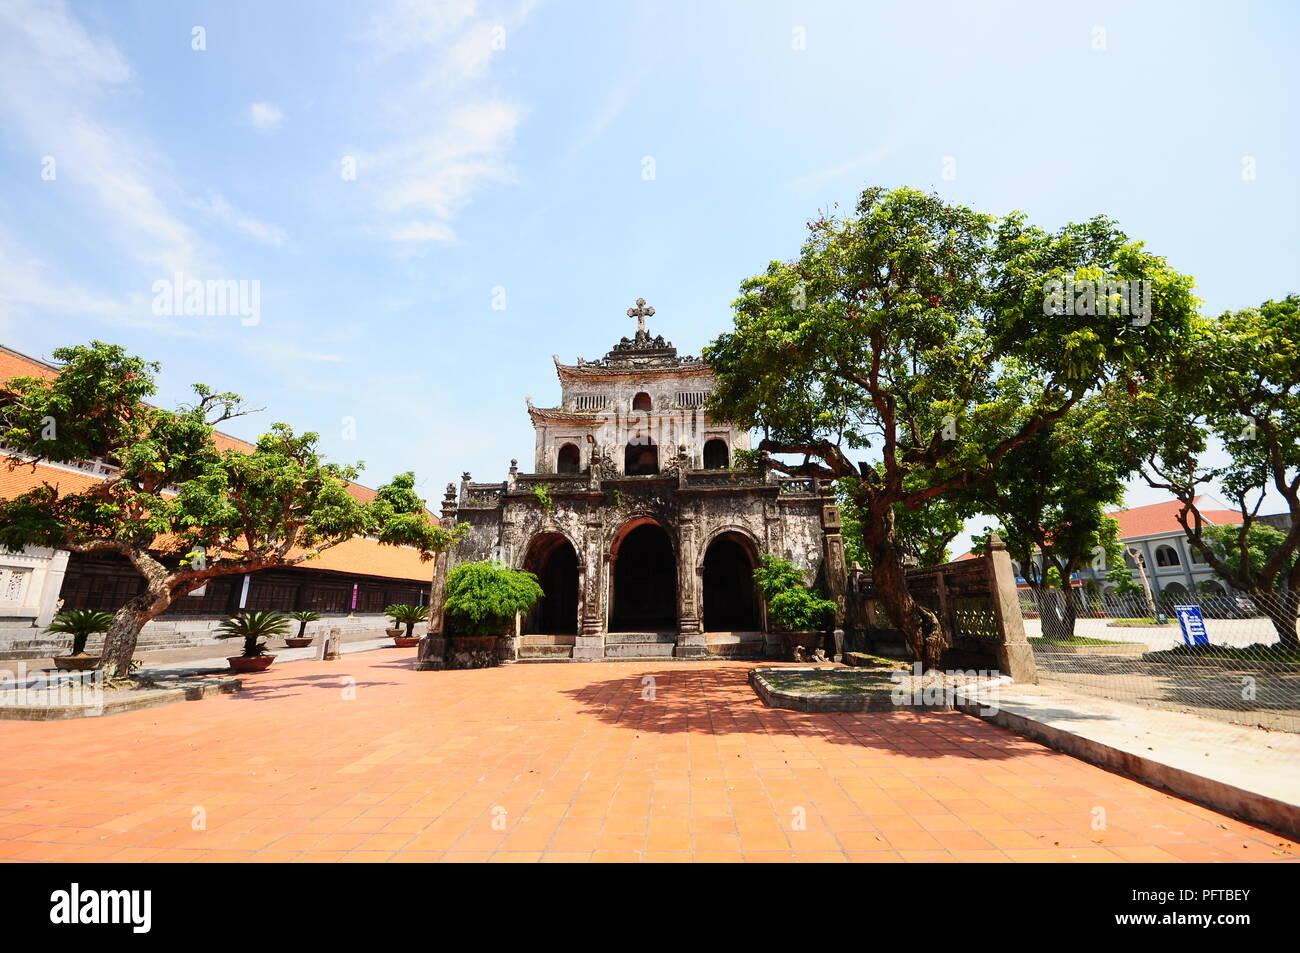 Phat Diem Cathedral in Ninh Binh, Viet Nam - Stock Image